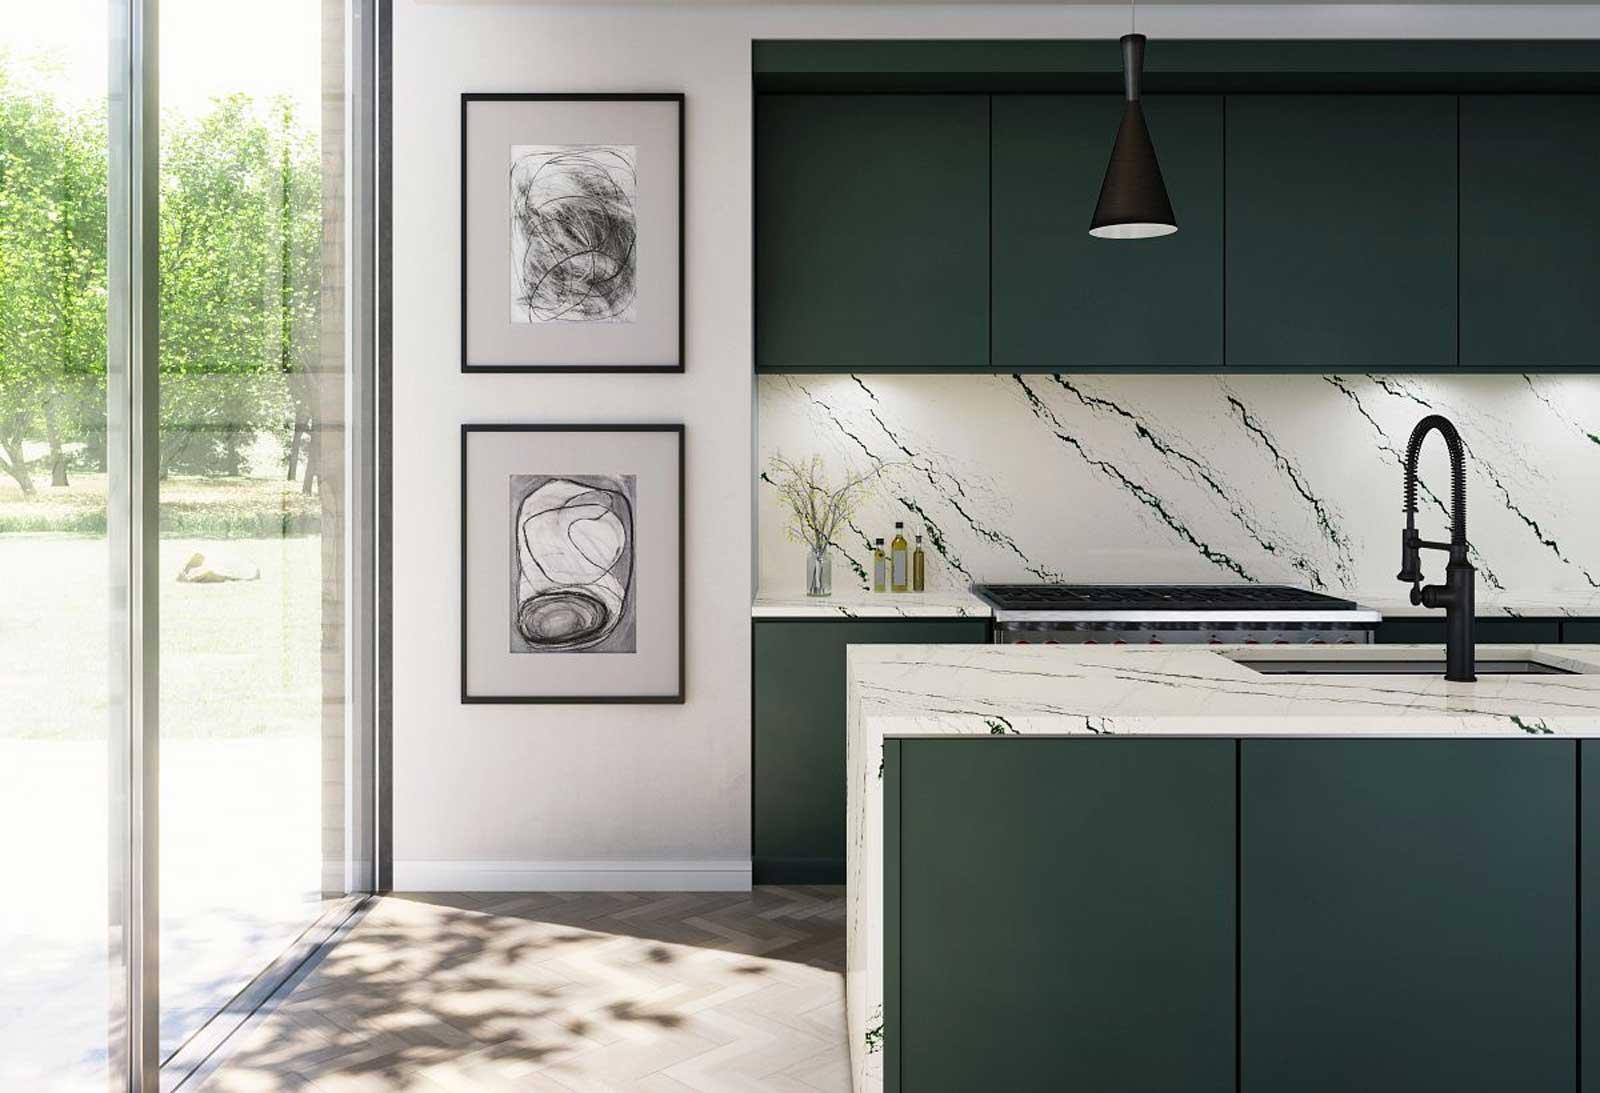 Cambria quartz countertops are the best. Get them from Innovative Kitchen & Bath, a Cambria Premier Dealer.